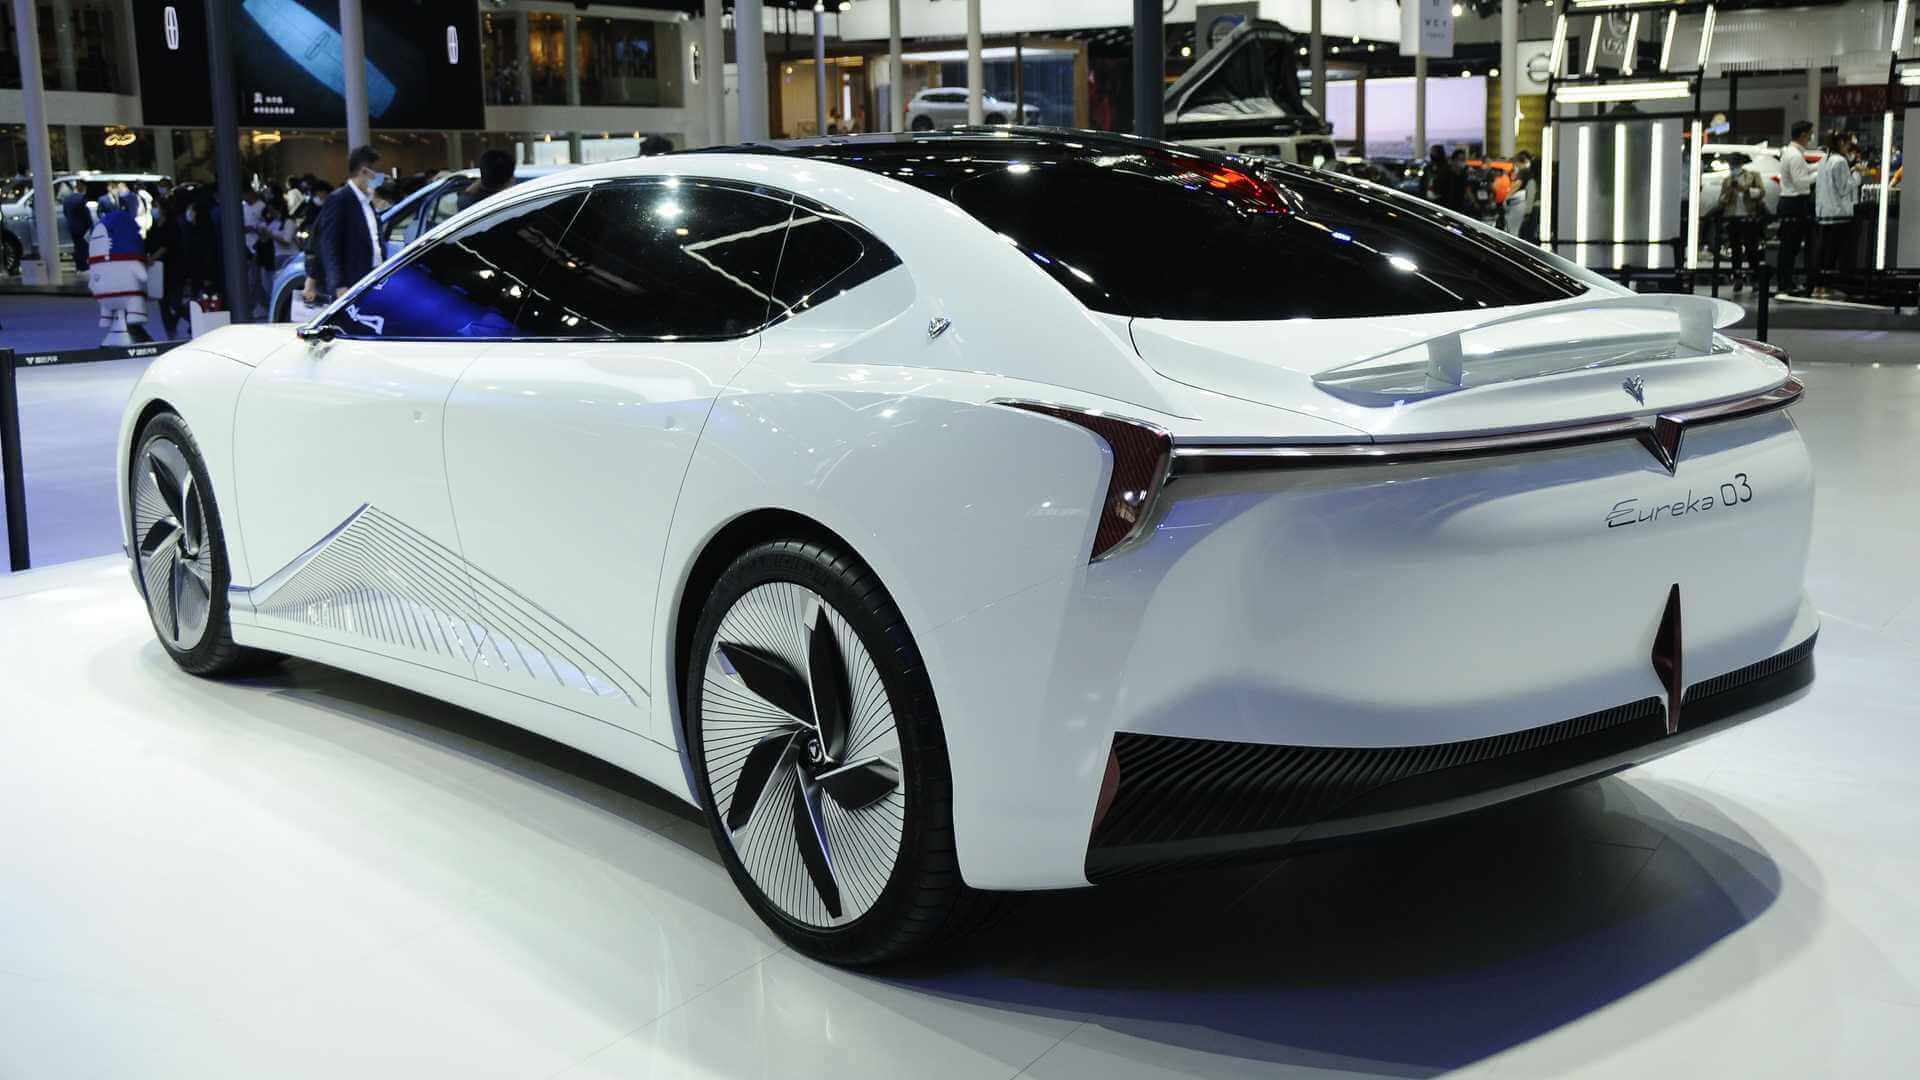 Концепт электромобиля Neta Eureka 03